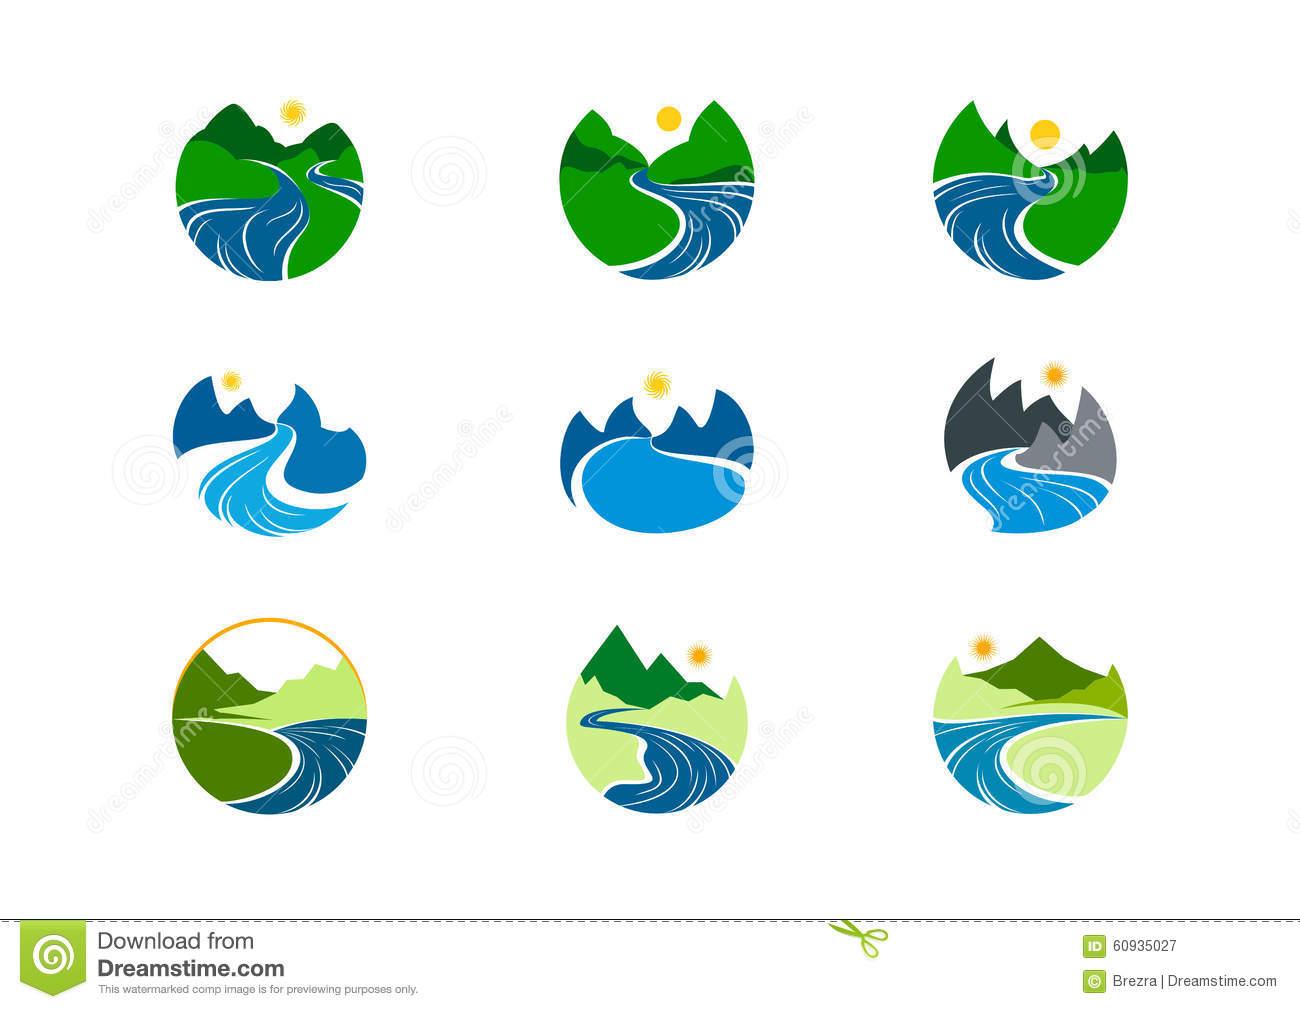 River logo clipart freeuse download River Logo, Nature Mountain Symbol Design Stock Vector - Image ... freeuse download